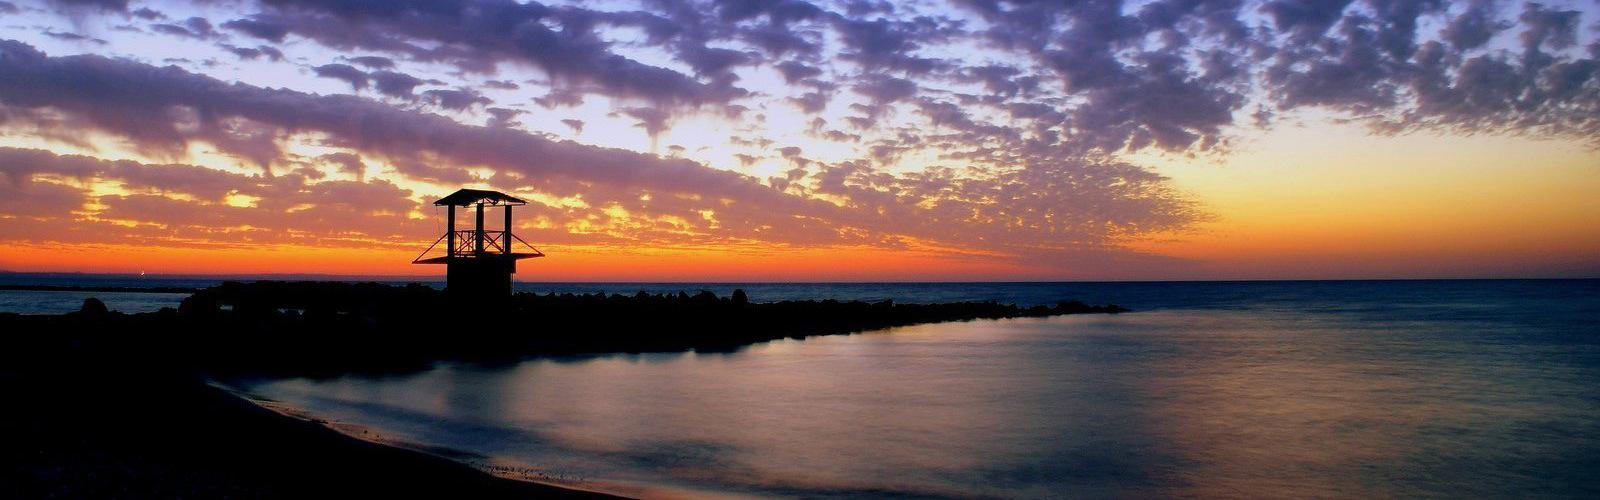 Cyprus_Larnaka_Sunset_lrg-002